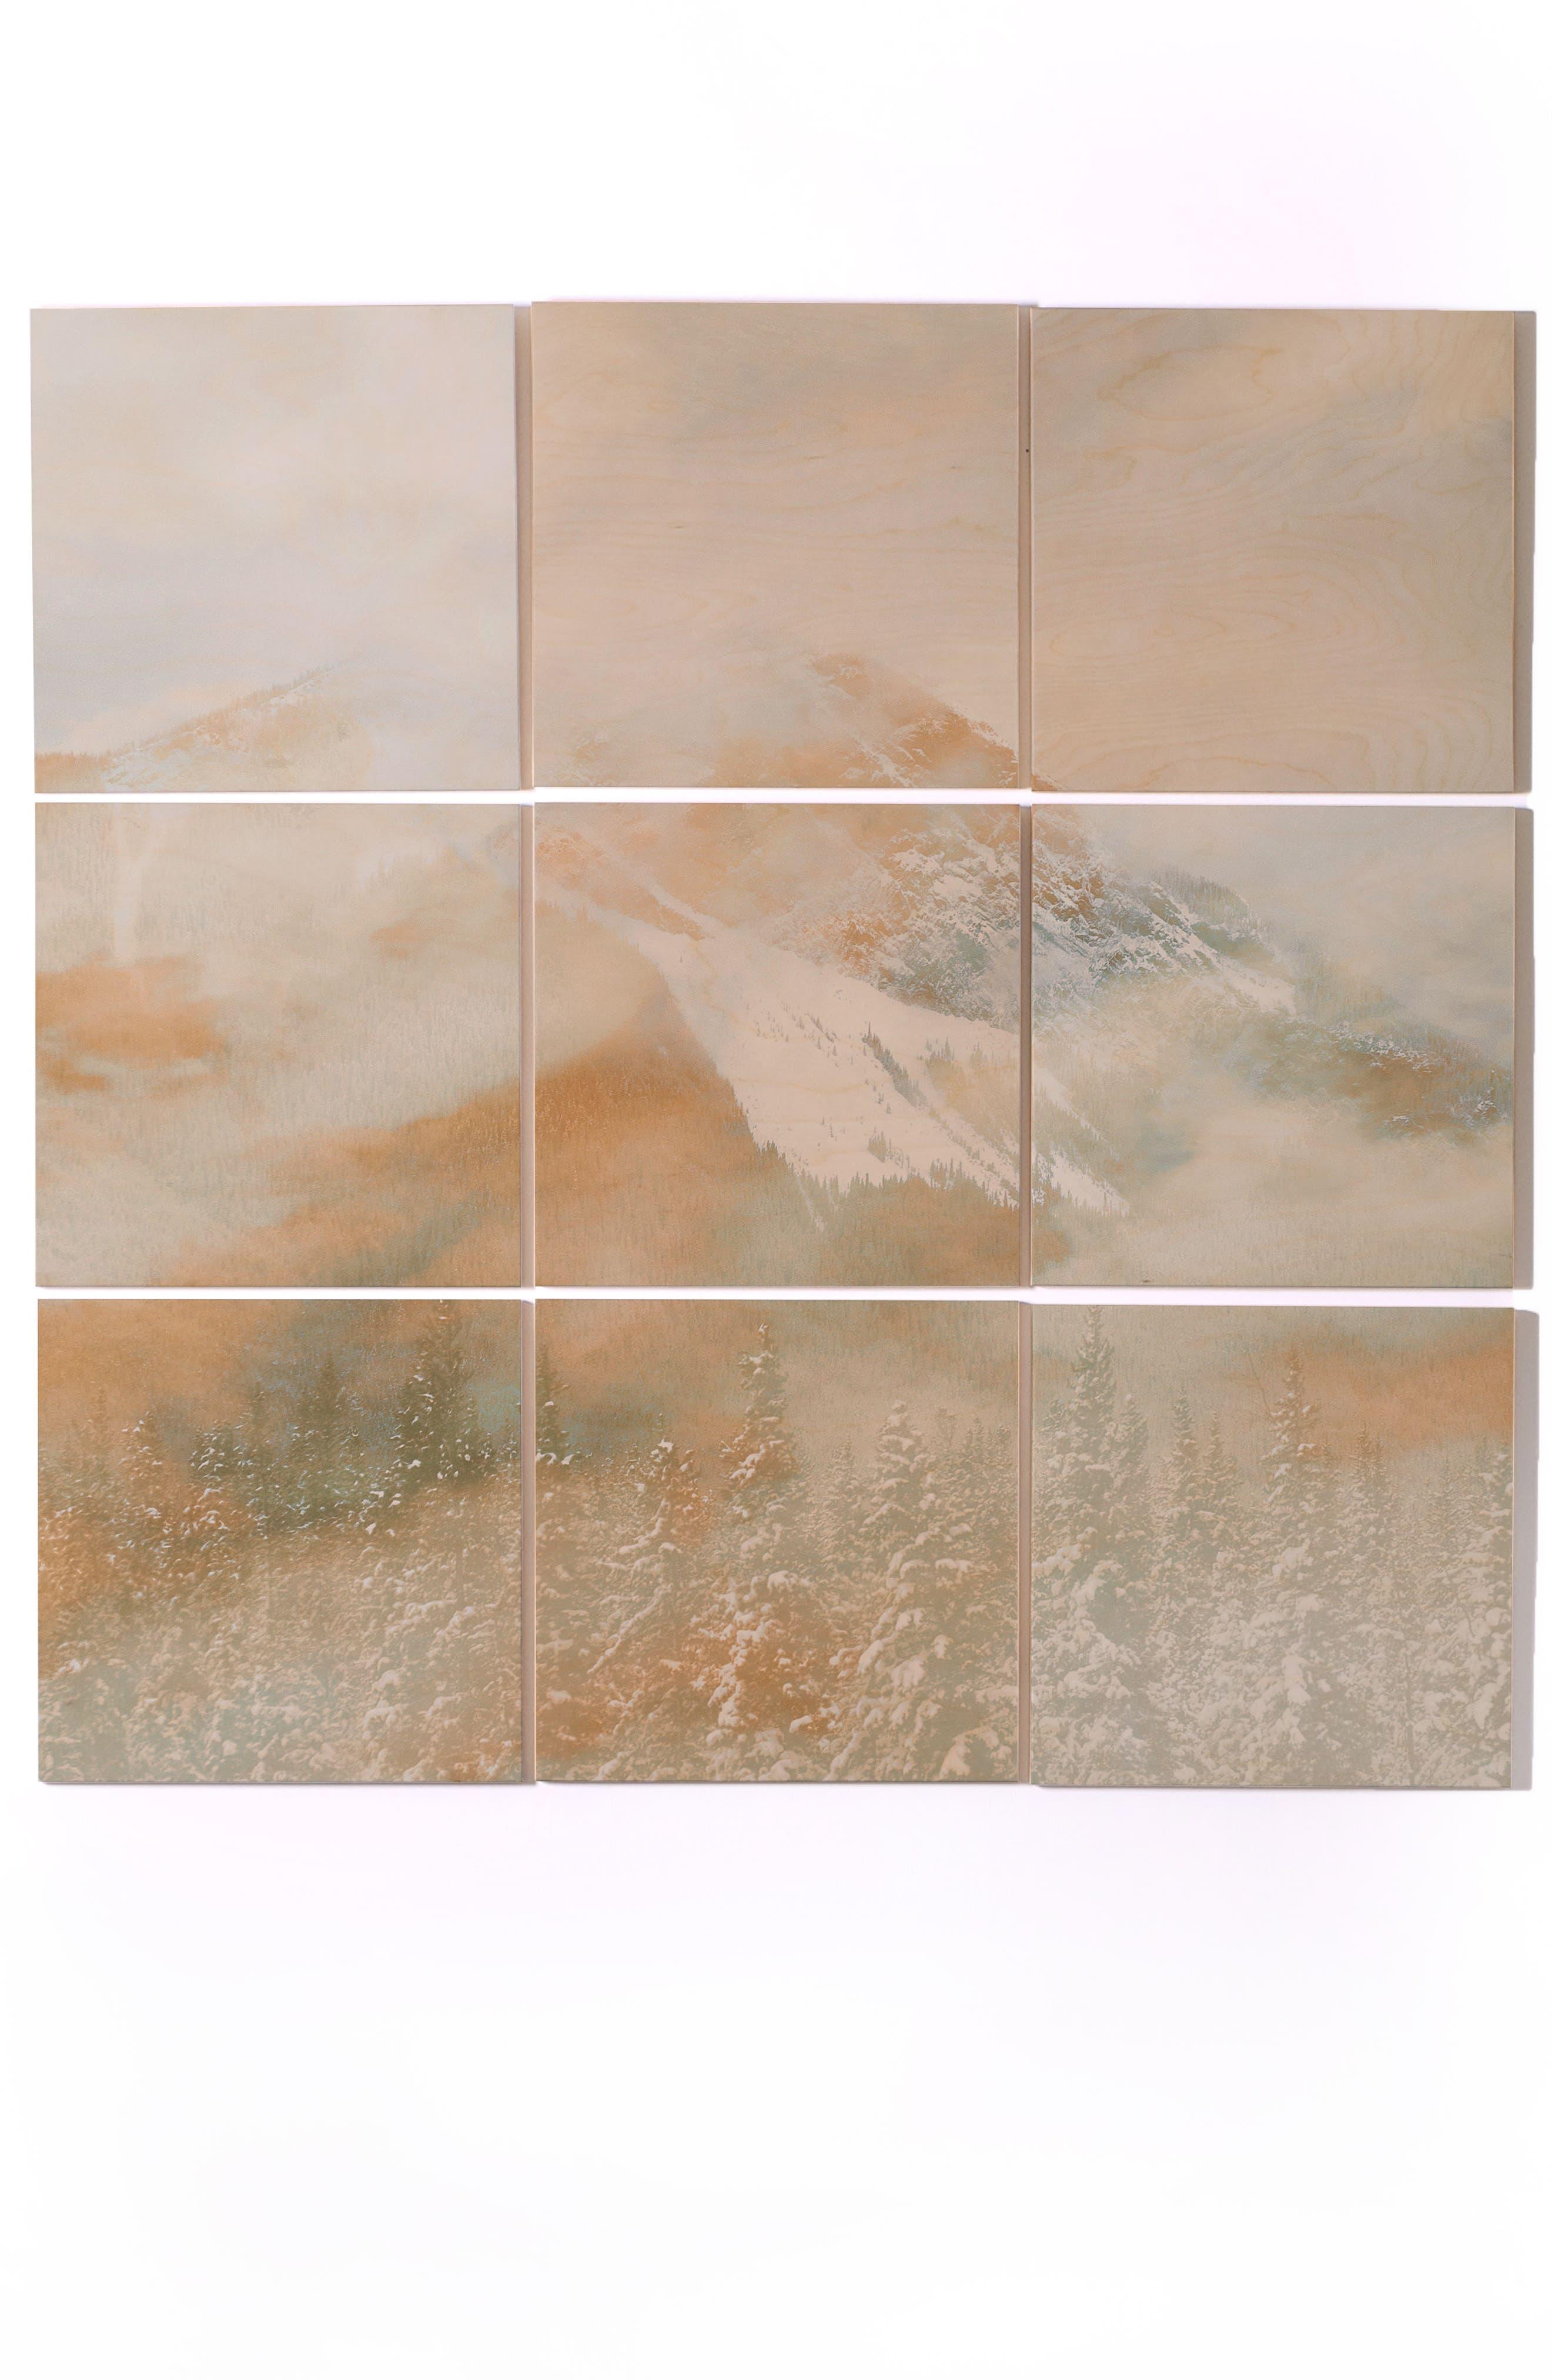 Golden Banff 9-Piece Wood Wall Mural,                         Main,                         color, GRAY/ GOLD